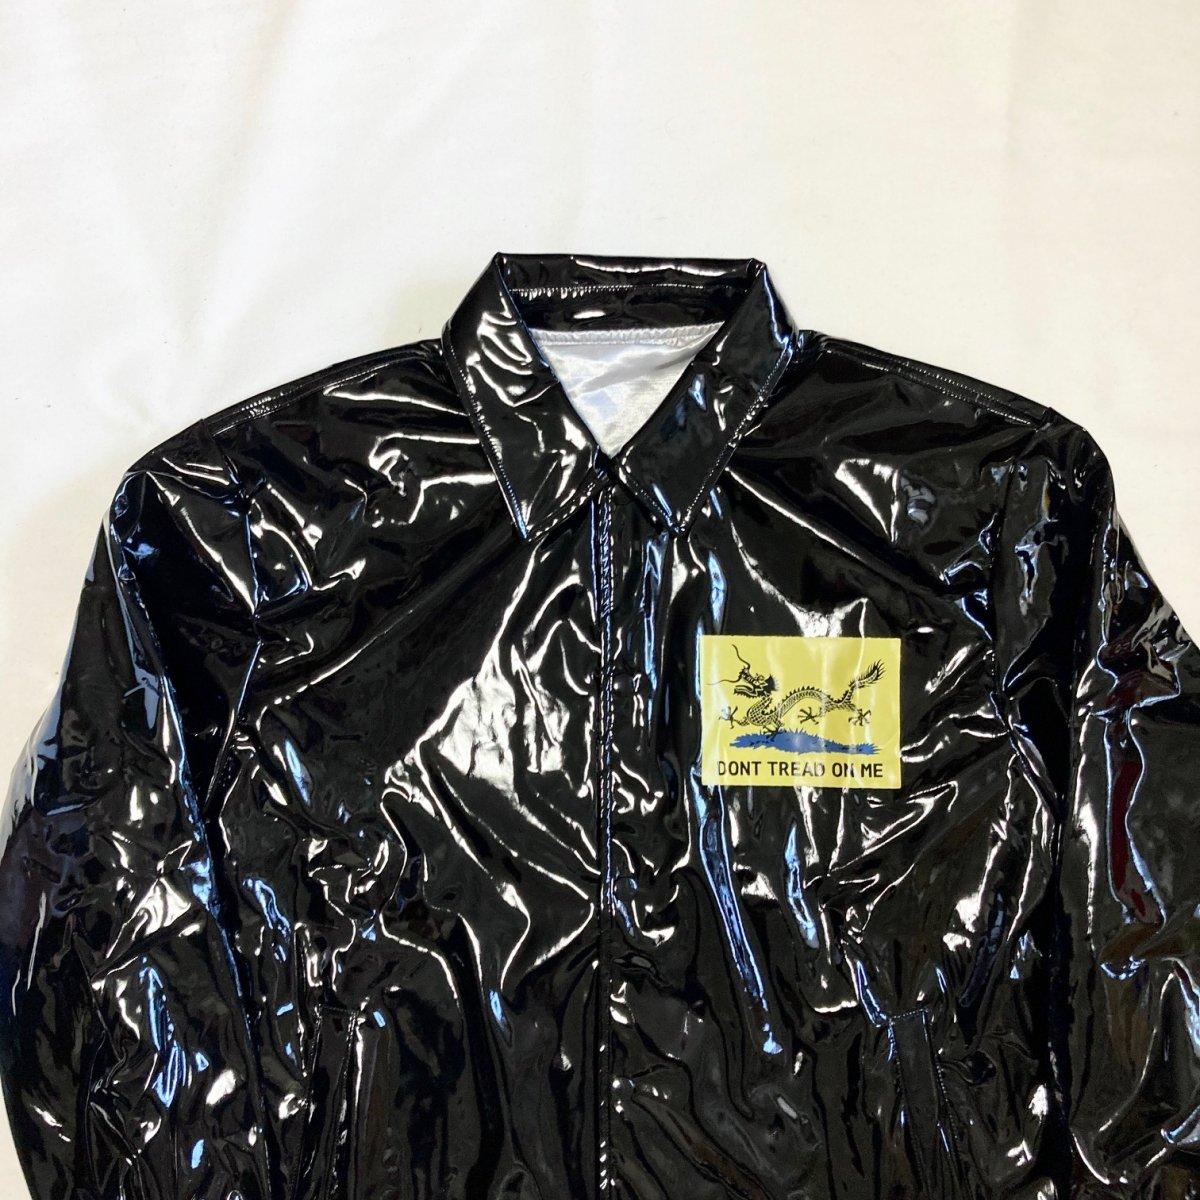 <img class='new_mark_img1' src='https://img.shop-pro.jp/img/new/icons3.gif' style='border:none;display:inline;margin:0px;padding:0px;width:auto;' />Black weirdos  ブラック ウィドー / ジャケット Enamel Coach jacket